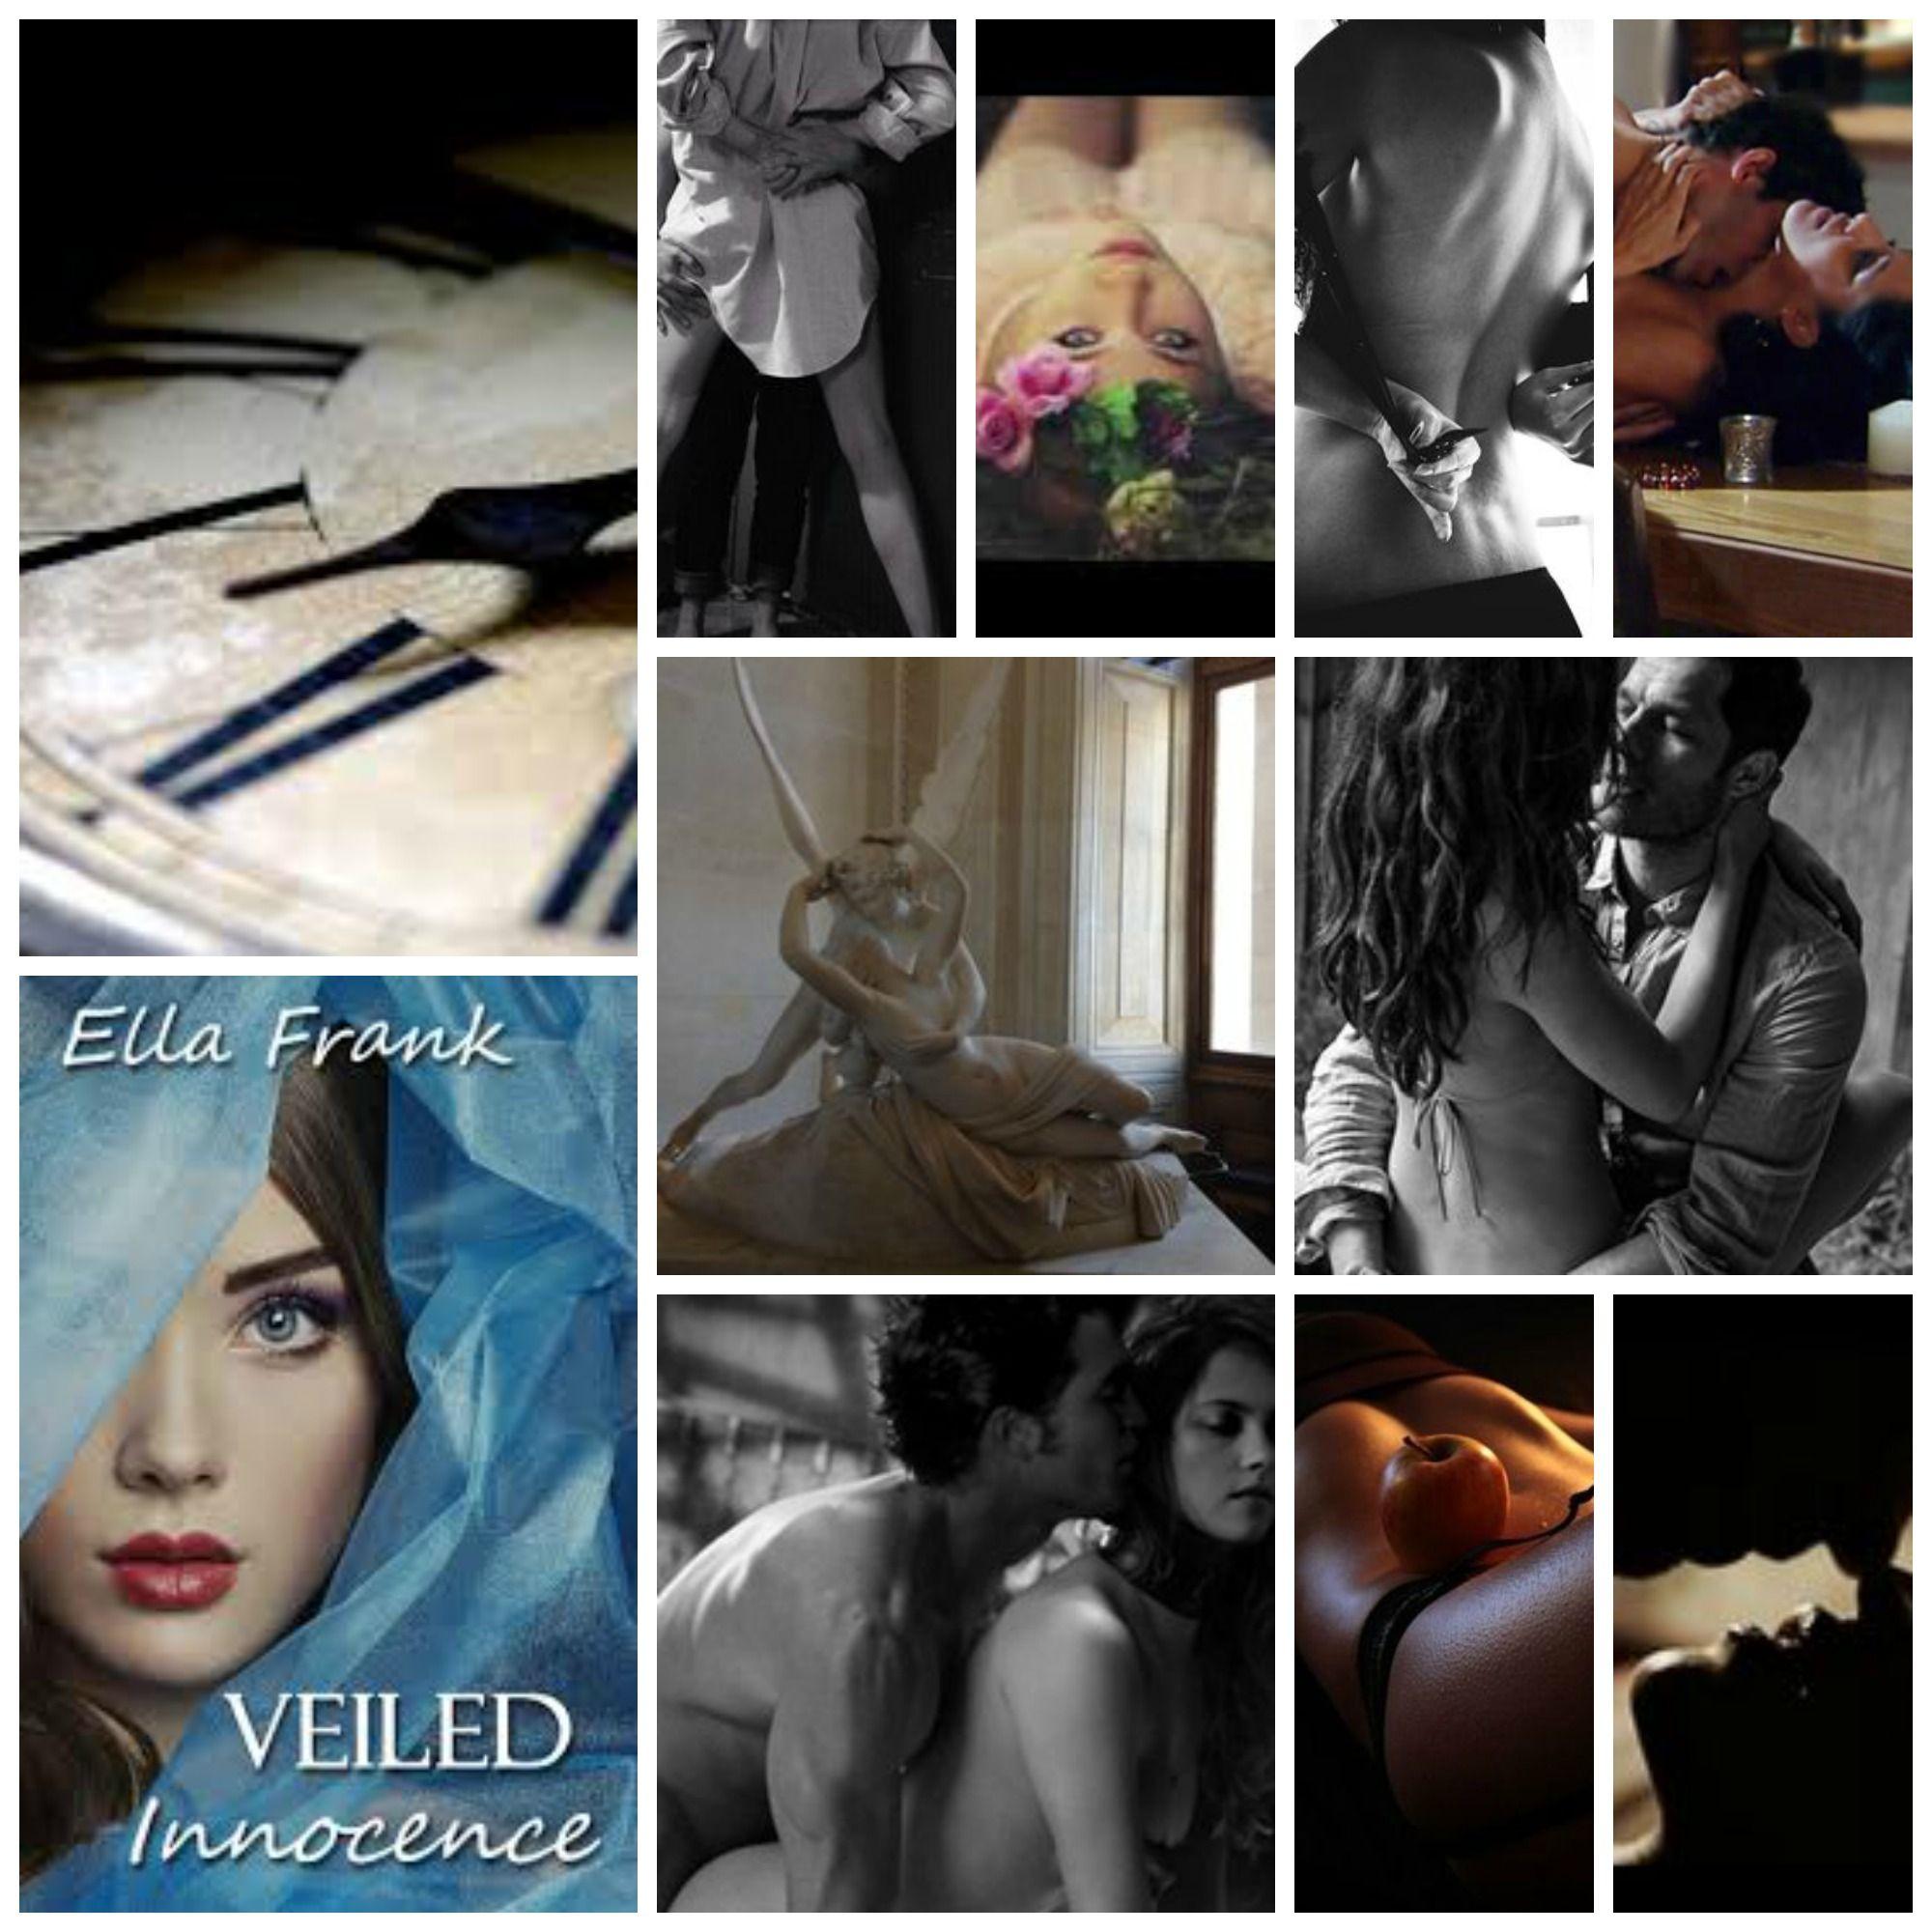 Veiled Innocence By Ela Frank Veil, Innocent, Movie posters